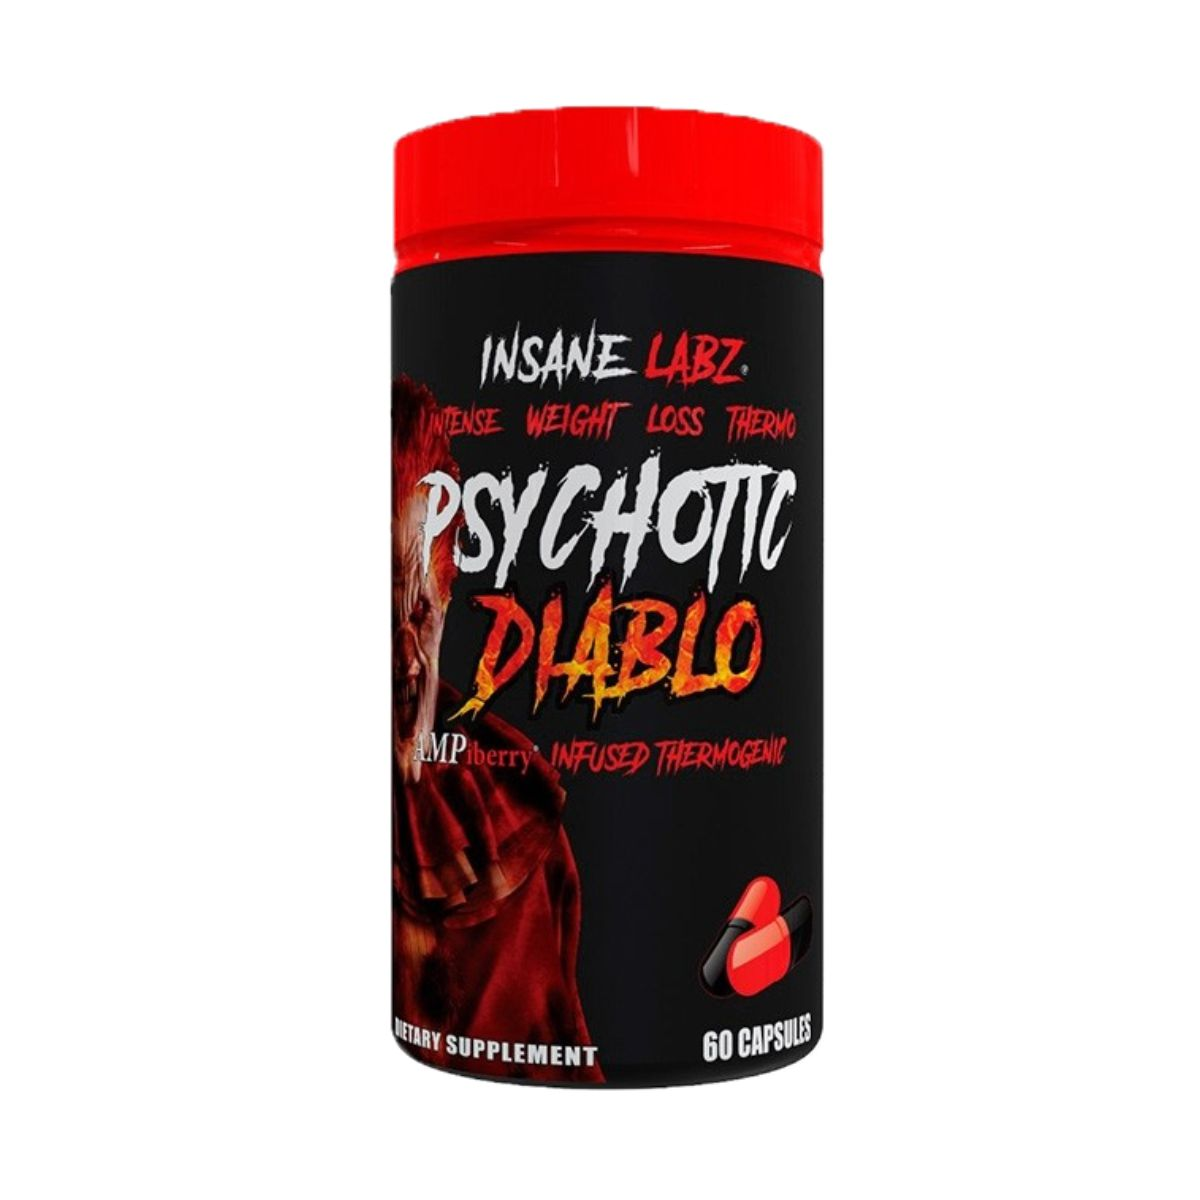 Termogênico Psychotic Diablo 60Caps - Insane Labz